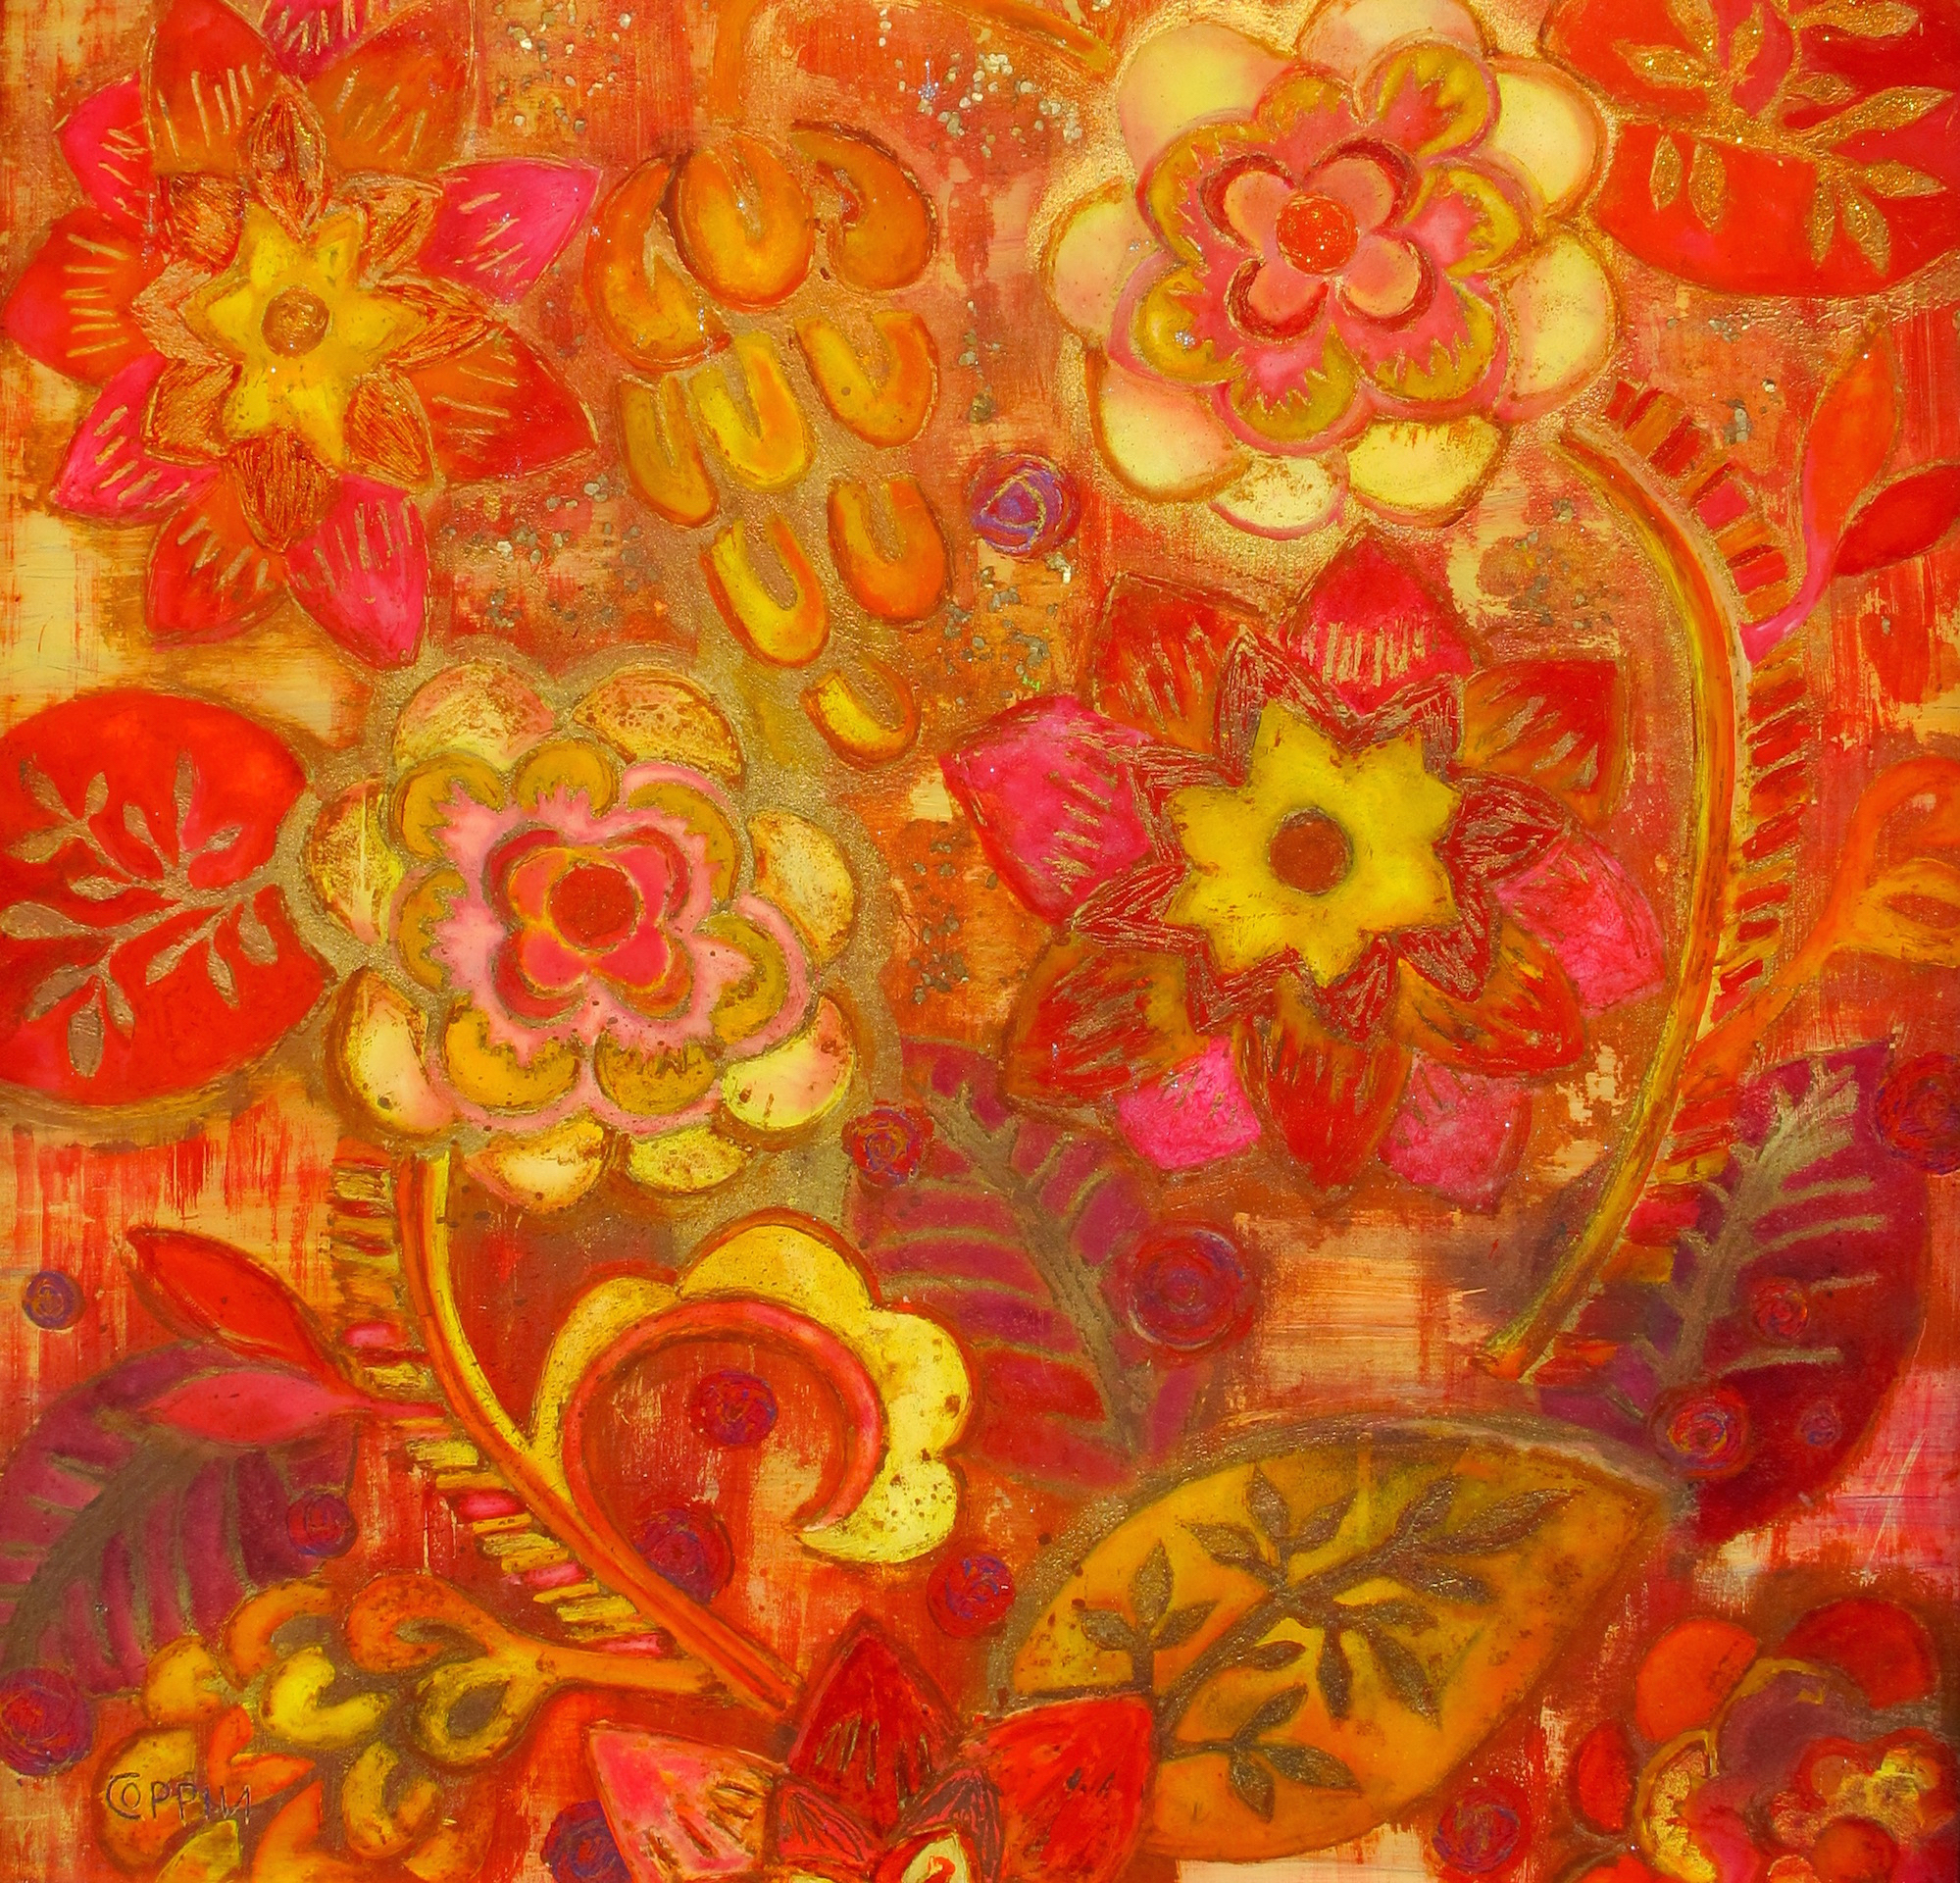 flower tapestry III - 26